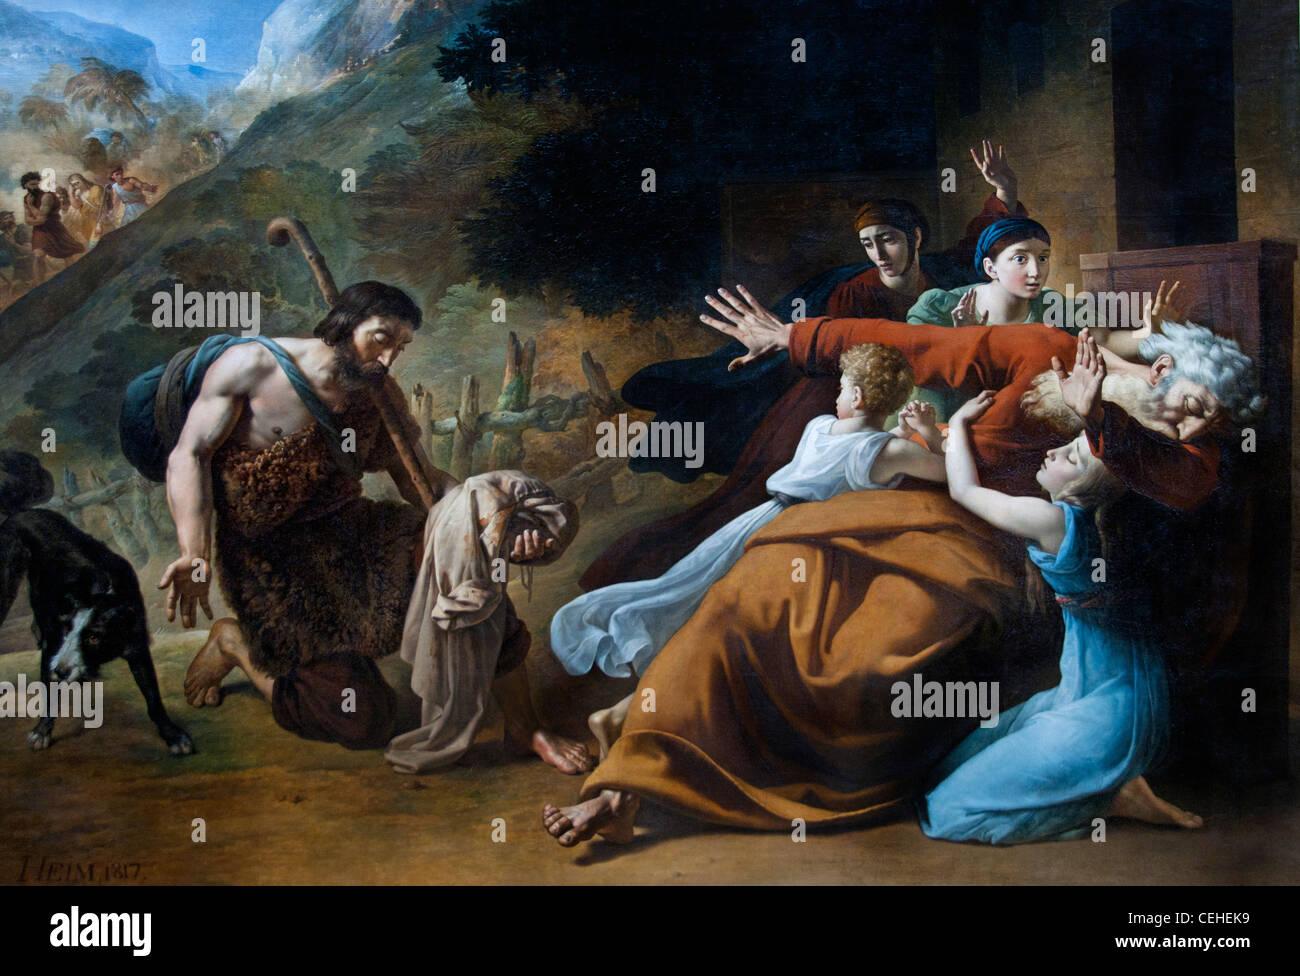 La Robe Ensanglantee 1817 The bloody robe Heim Francois Joseph French France - Stock Image